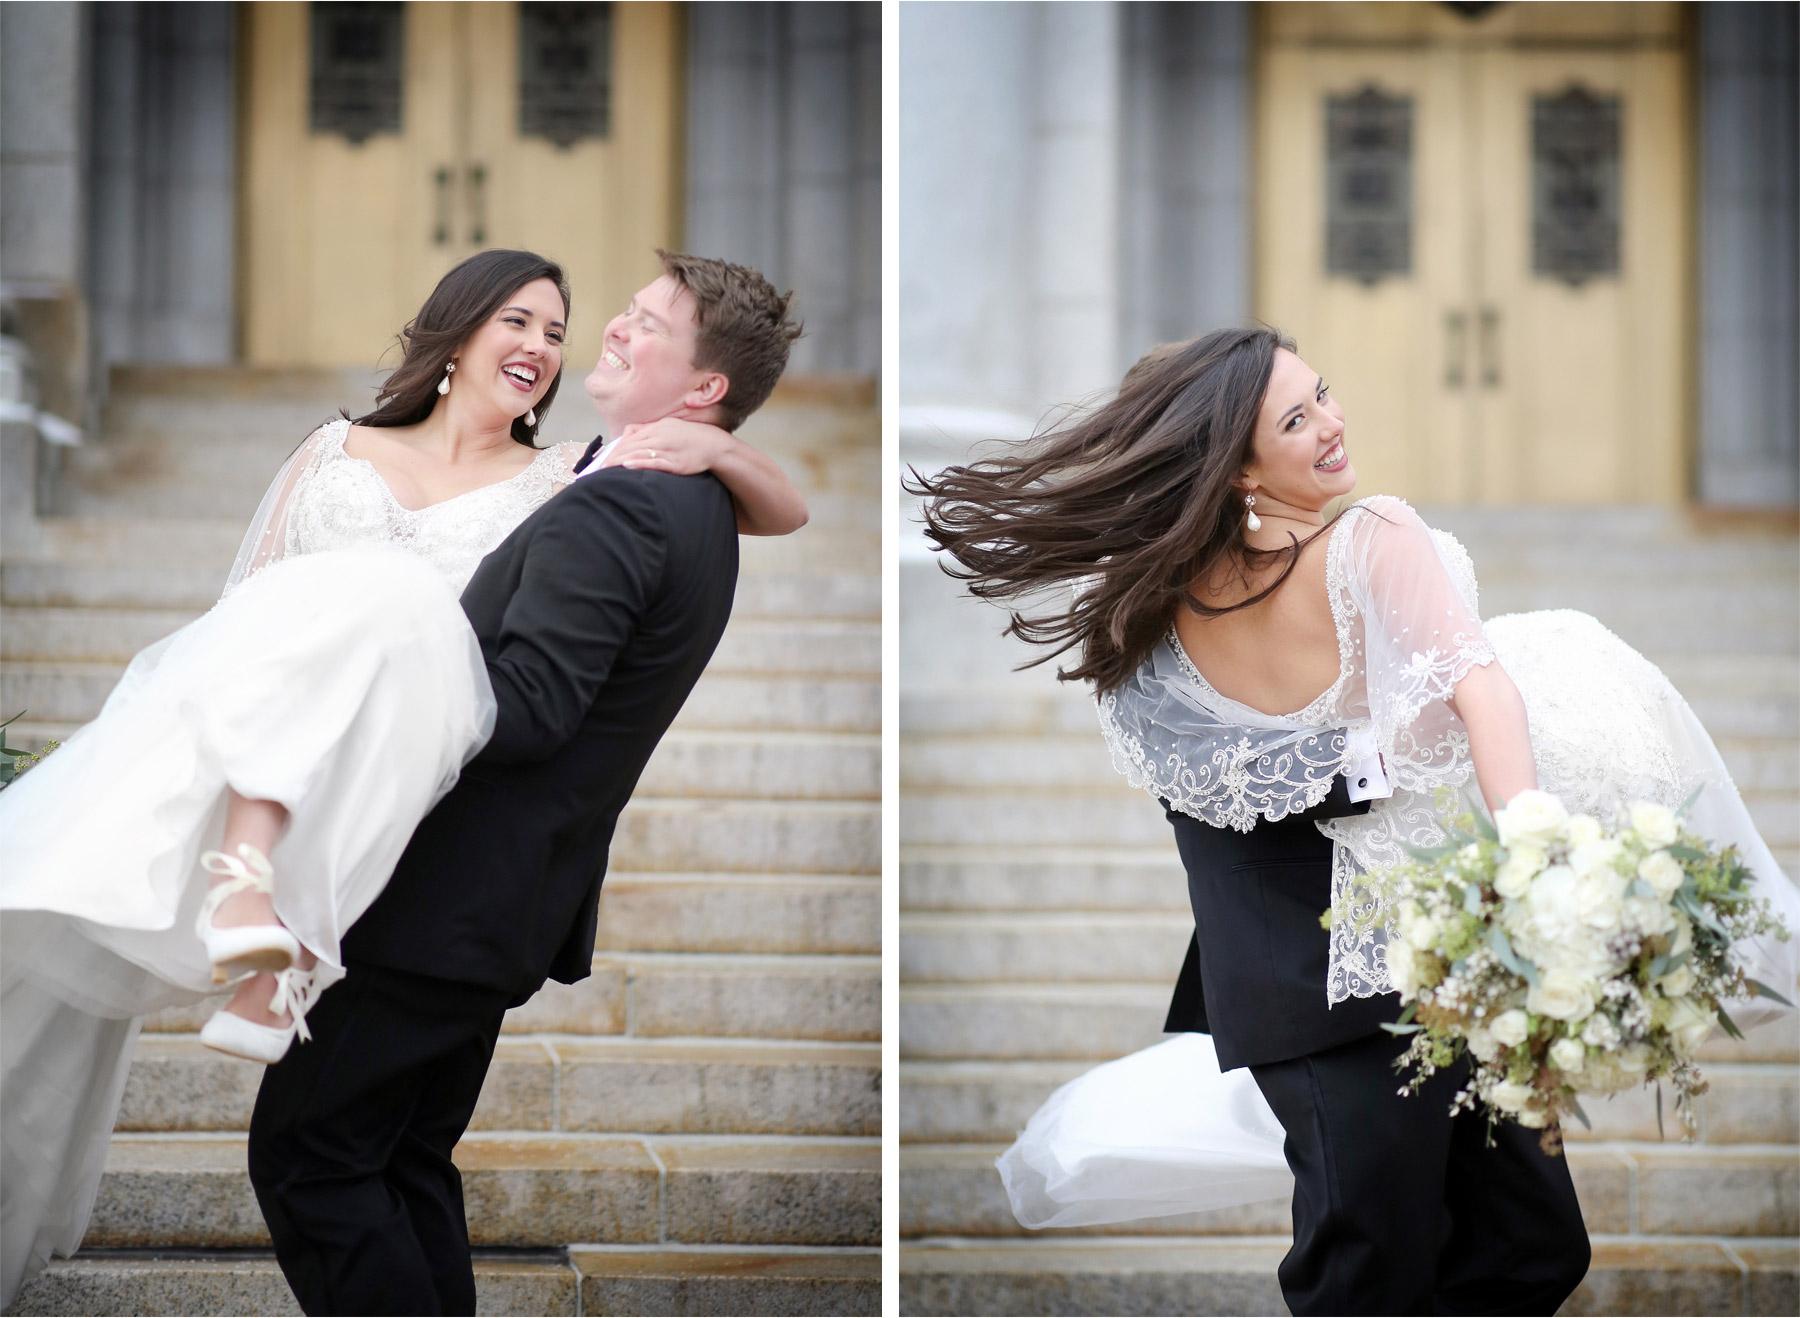 11-Saint-Paul-Minnesota-Wedding-Photography-by-Vick-Photography-Basilica-of-Saint-Mary-Couple-Winter-Wedding-Sami-and-Nick.jpg